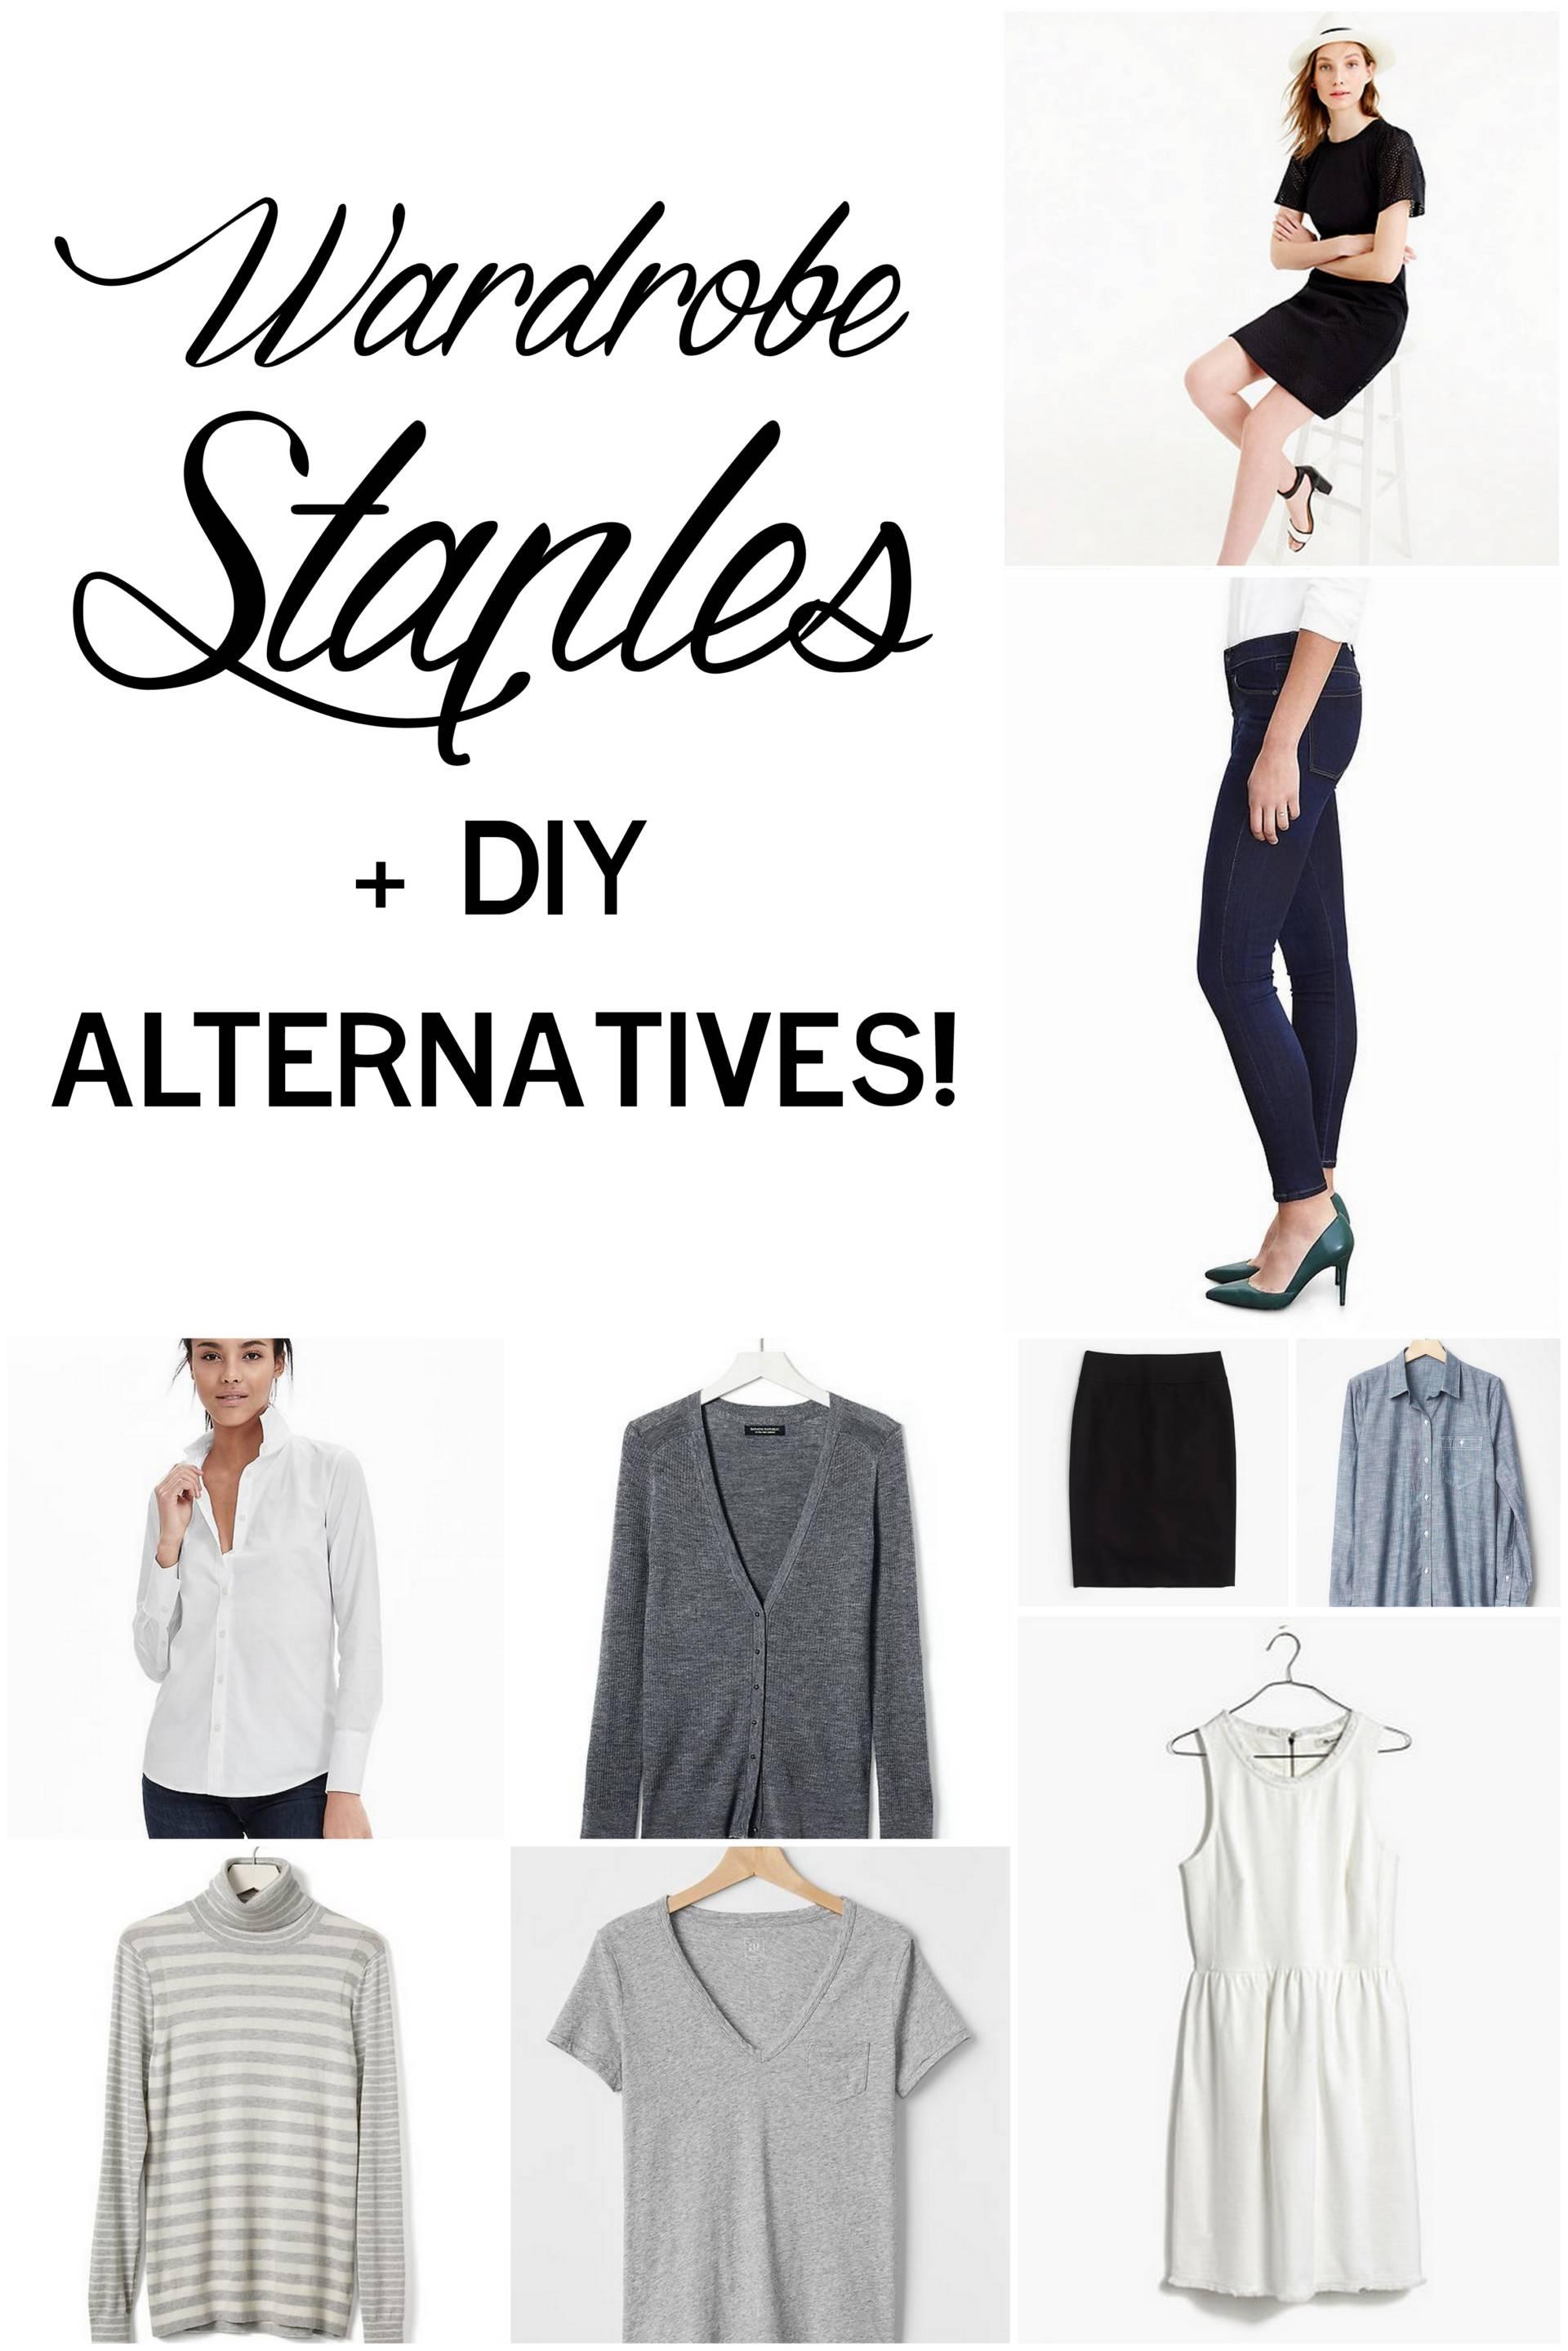 expanding your closet with handmade wardrobe staples